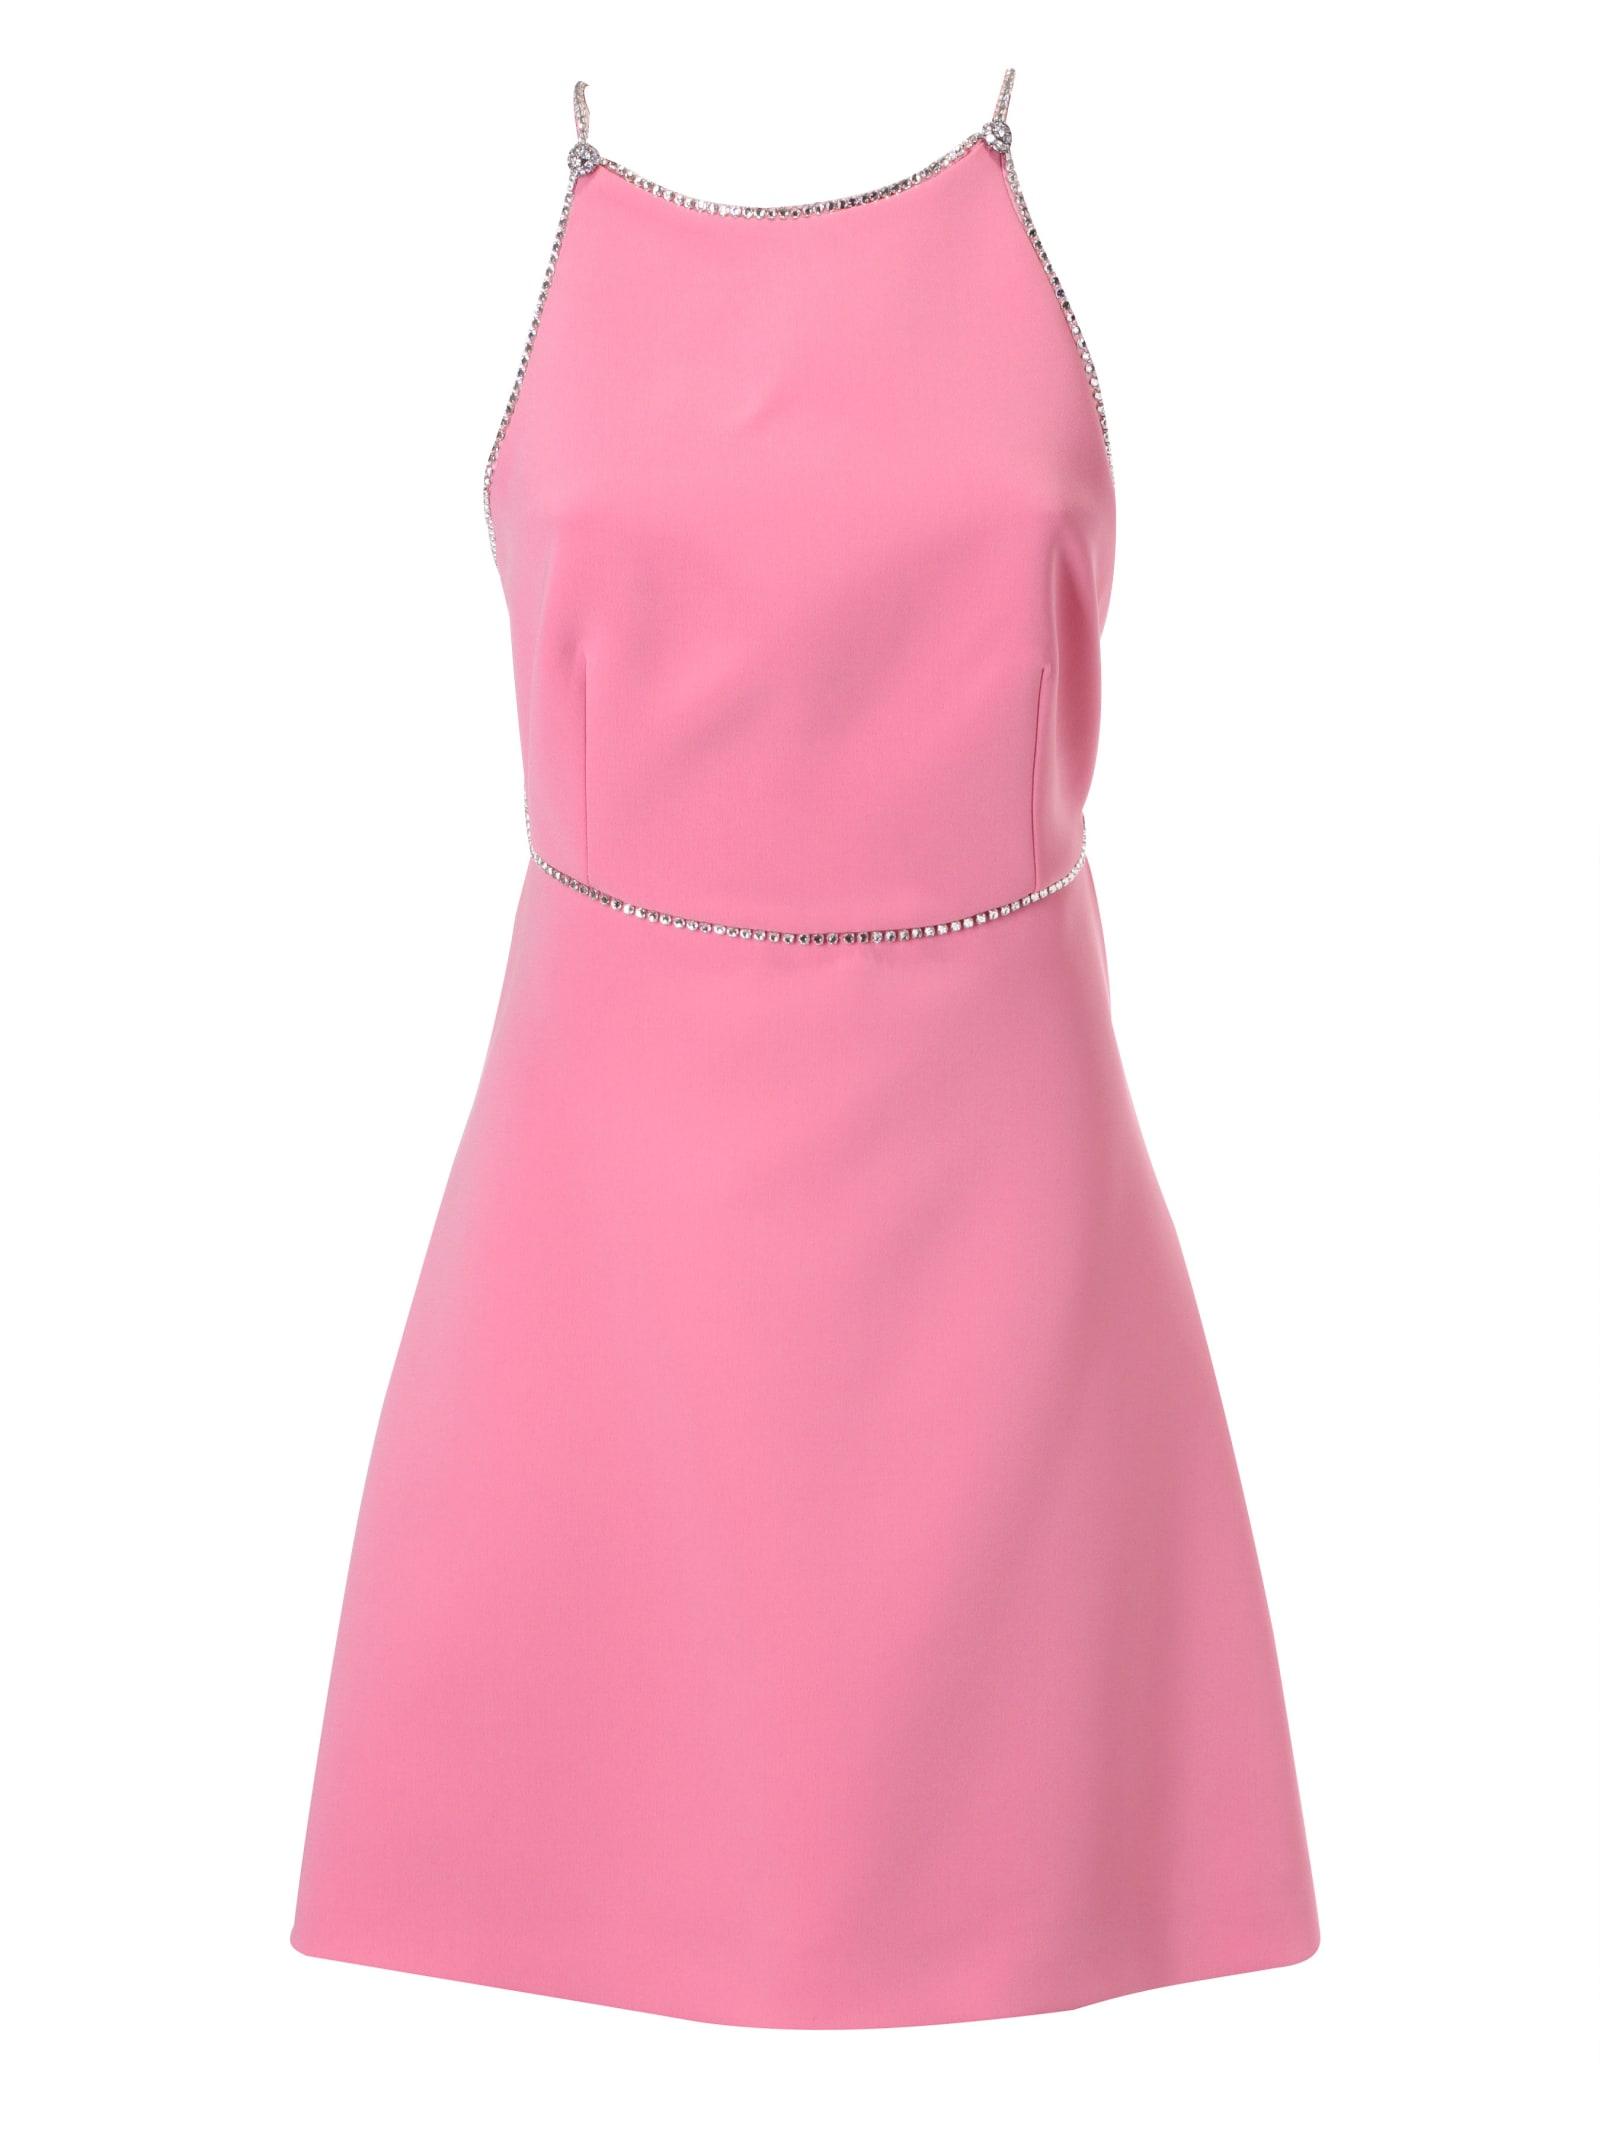 Buy Miu Miu Backless Flared Dress online, shop Miu Miu with free shipping